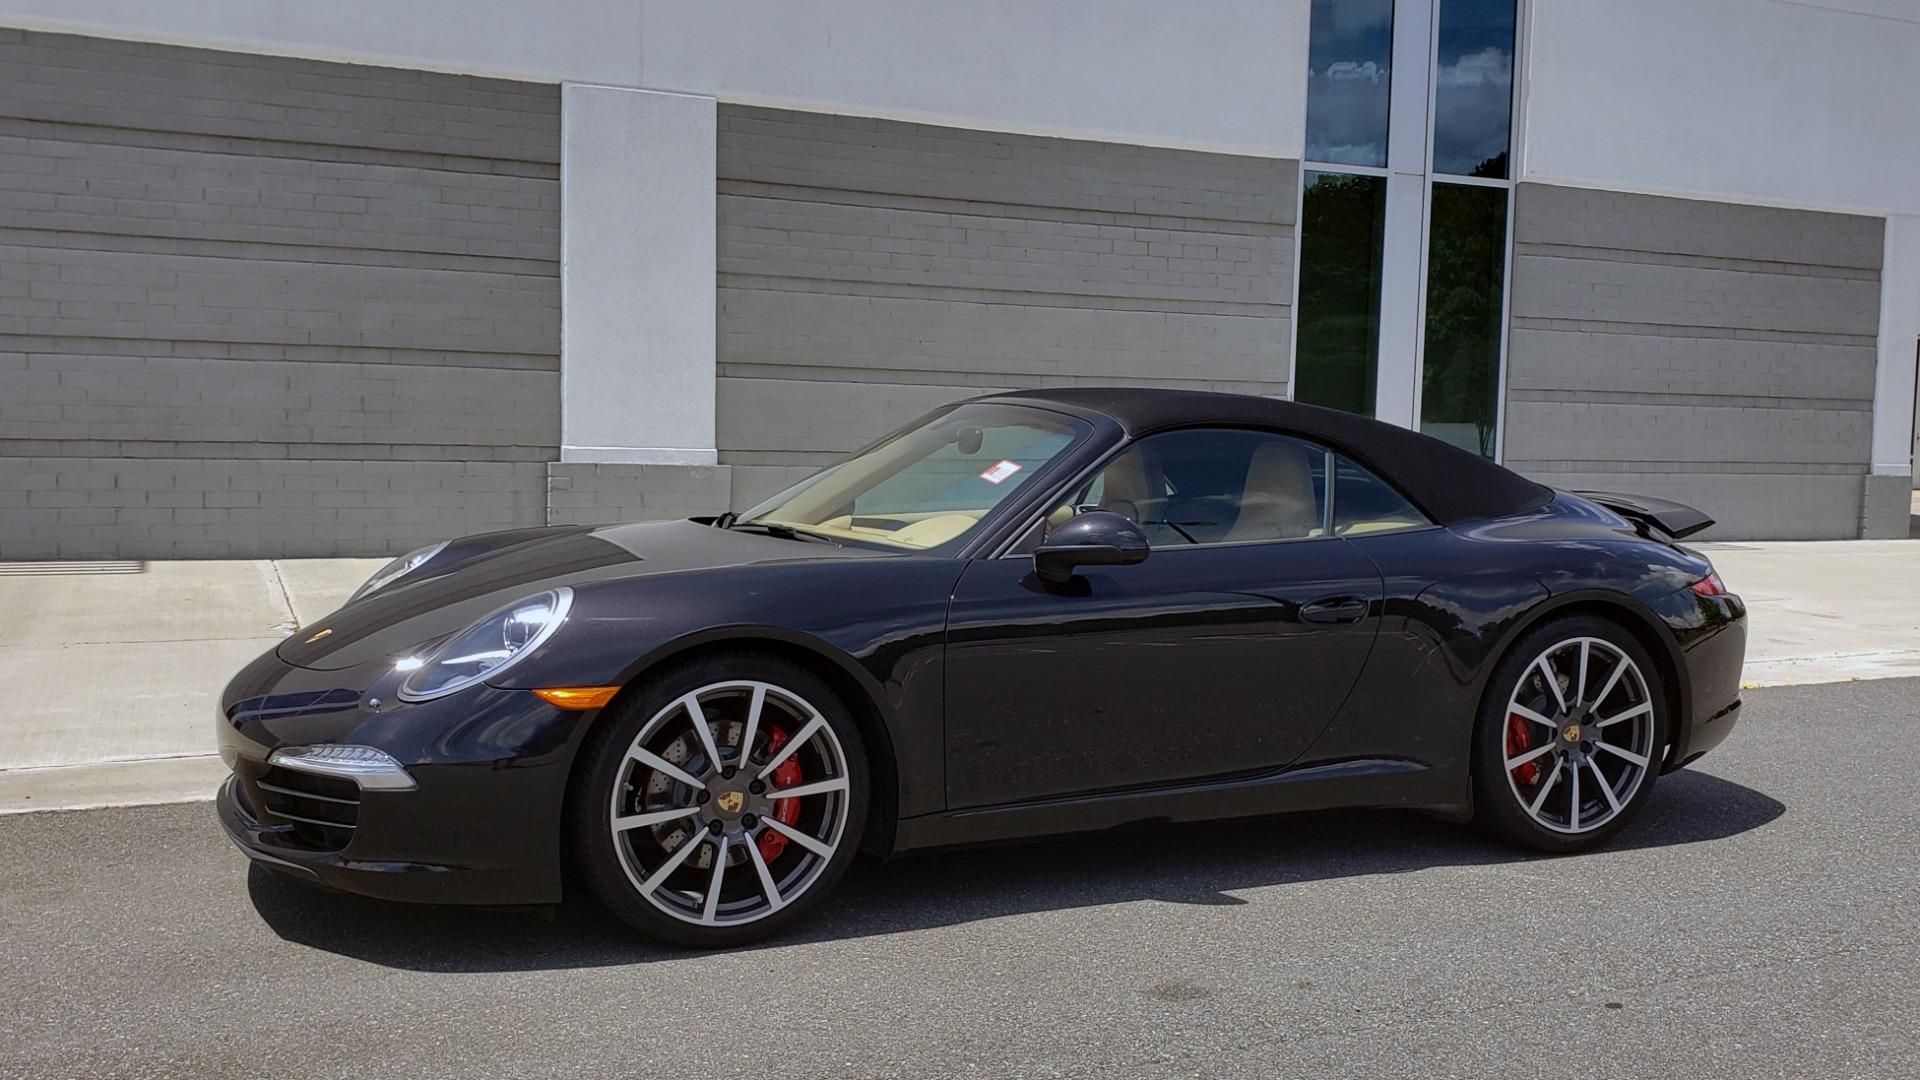 Used 2014 Porsche 911 CARRERA S CABRIOLET / PREM PKG / PDK / NAV / BOSE / SPORT CHRONO for sale $81,995 at Formula Imports in Charlotte NC 28227 6